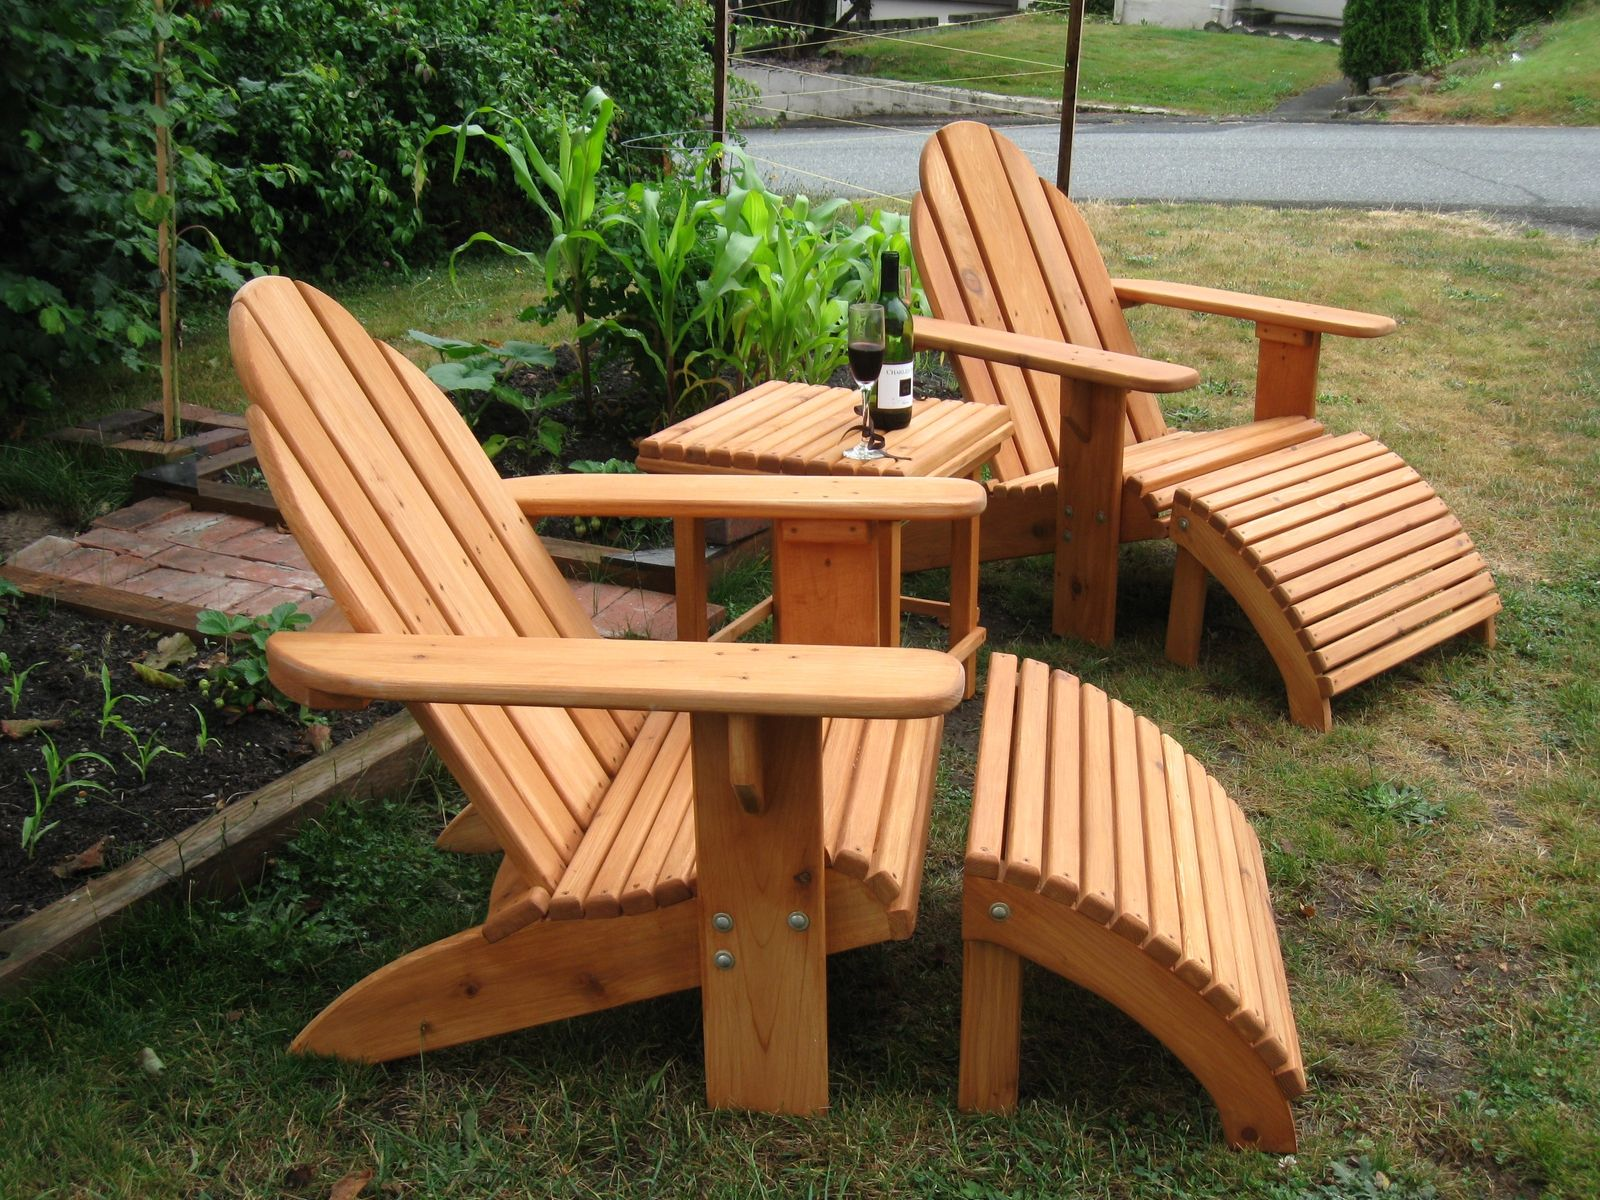 Handmade adirondack patio set by sam 39 s workshop for Adirondack ottoman plans